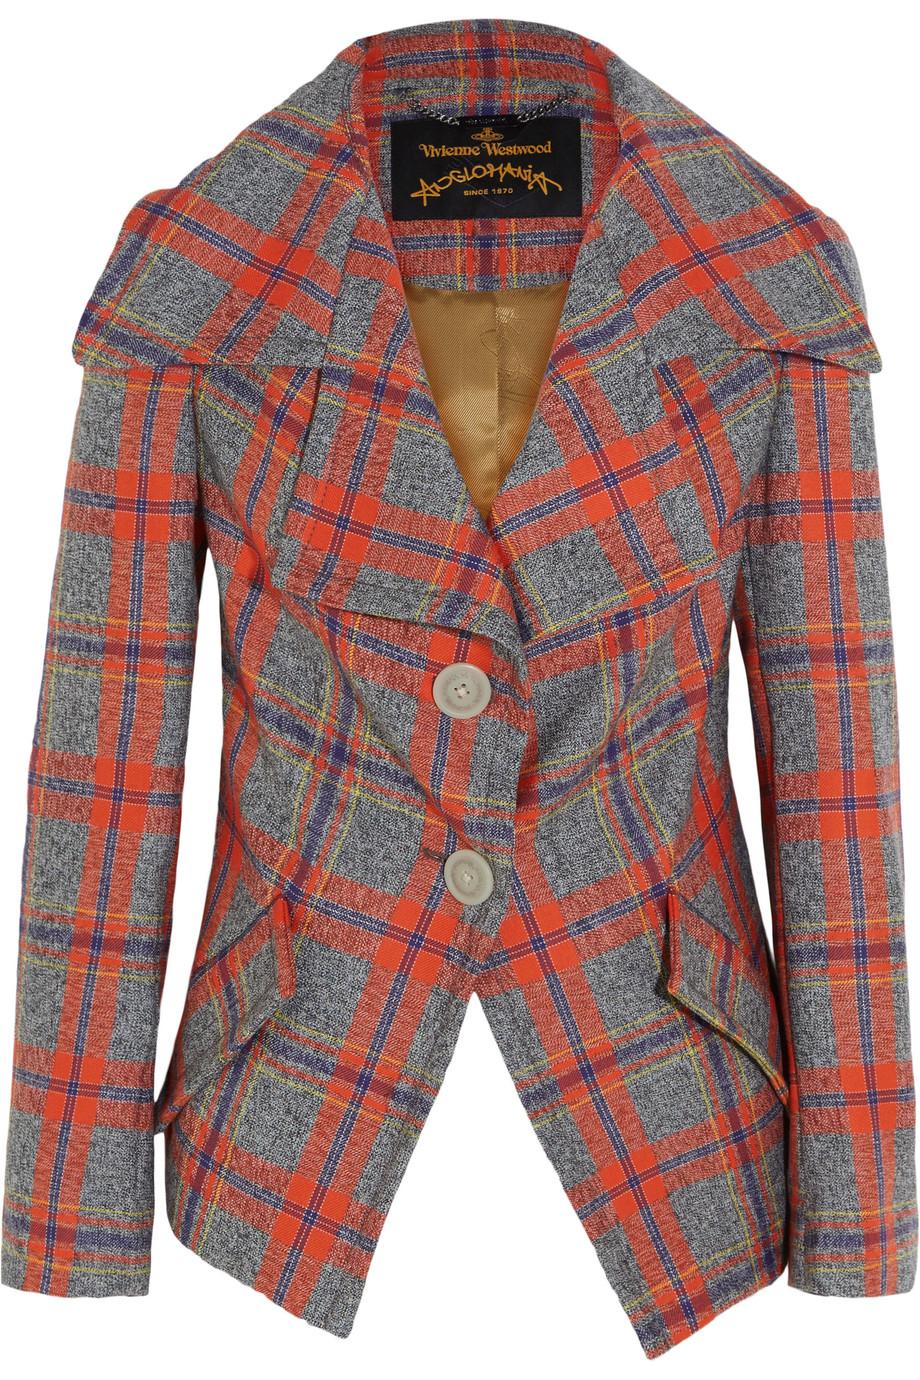 Propaganda Tartan Wool Jacket, Vivienne Westwood Anglomania, Red, Women's, Size: 38